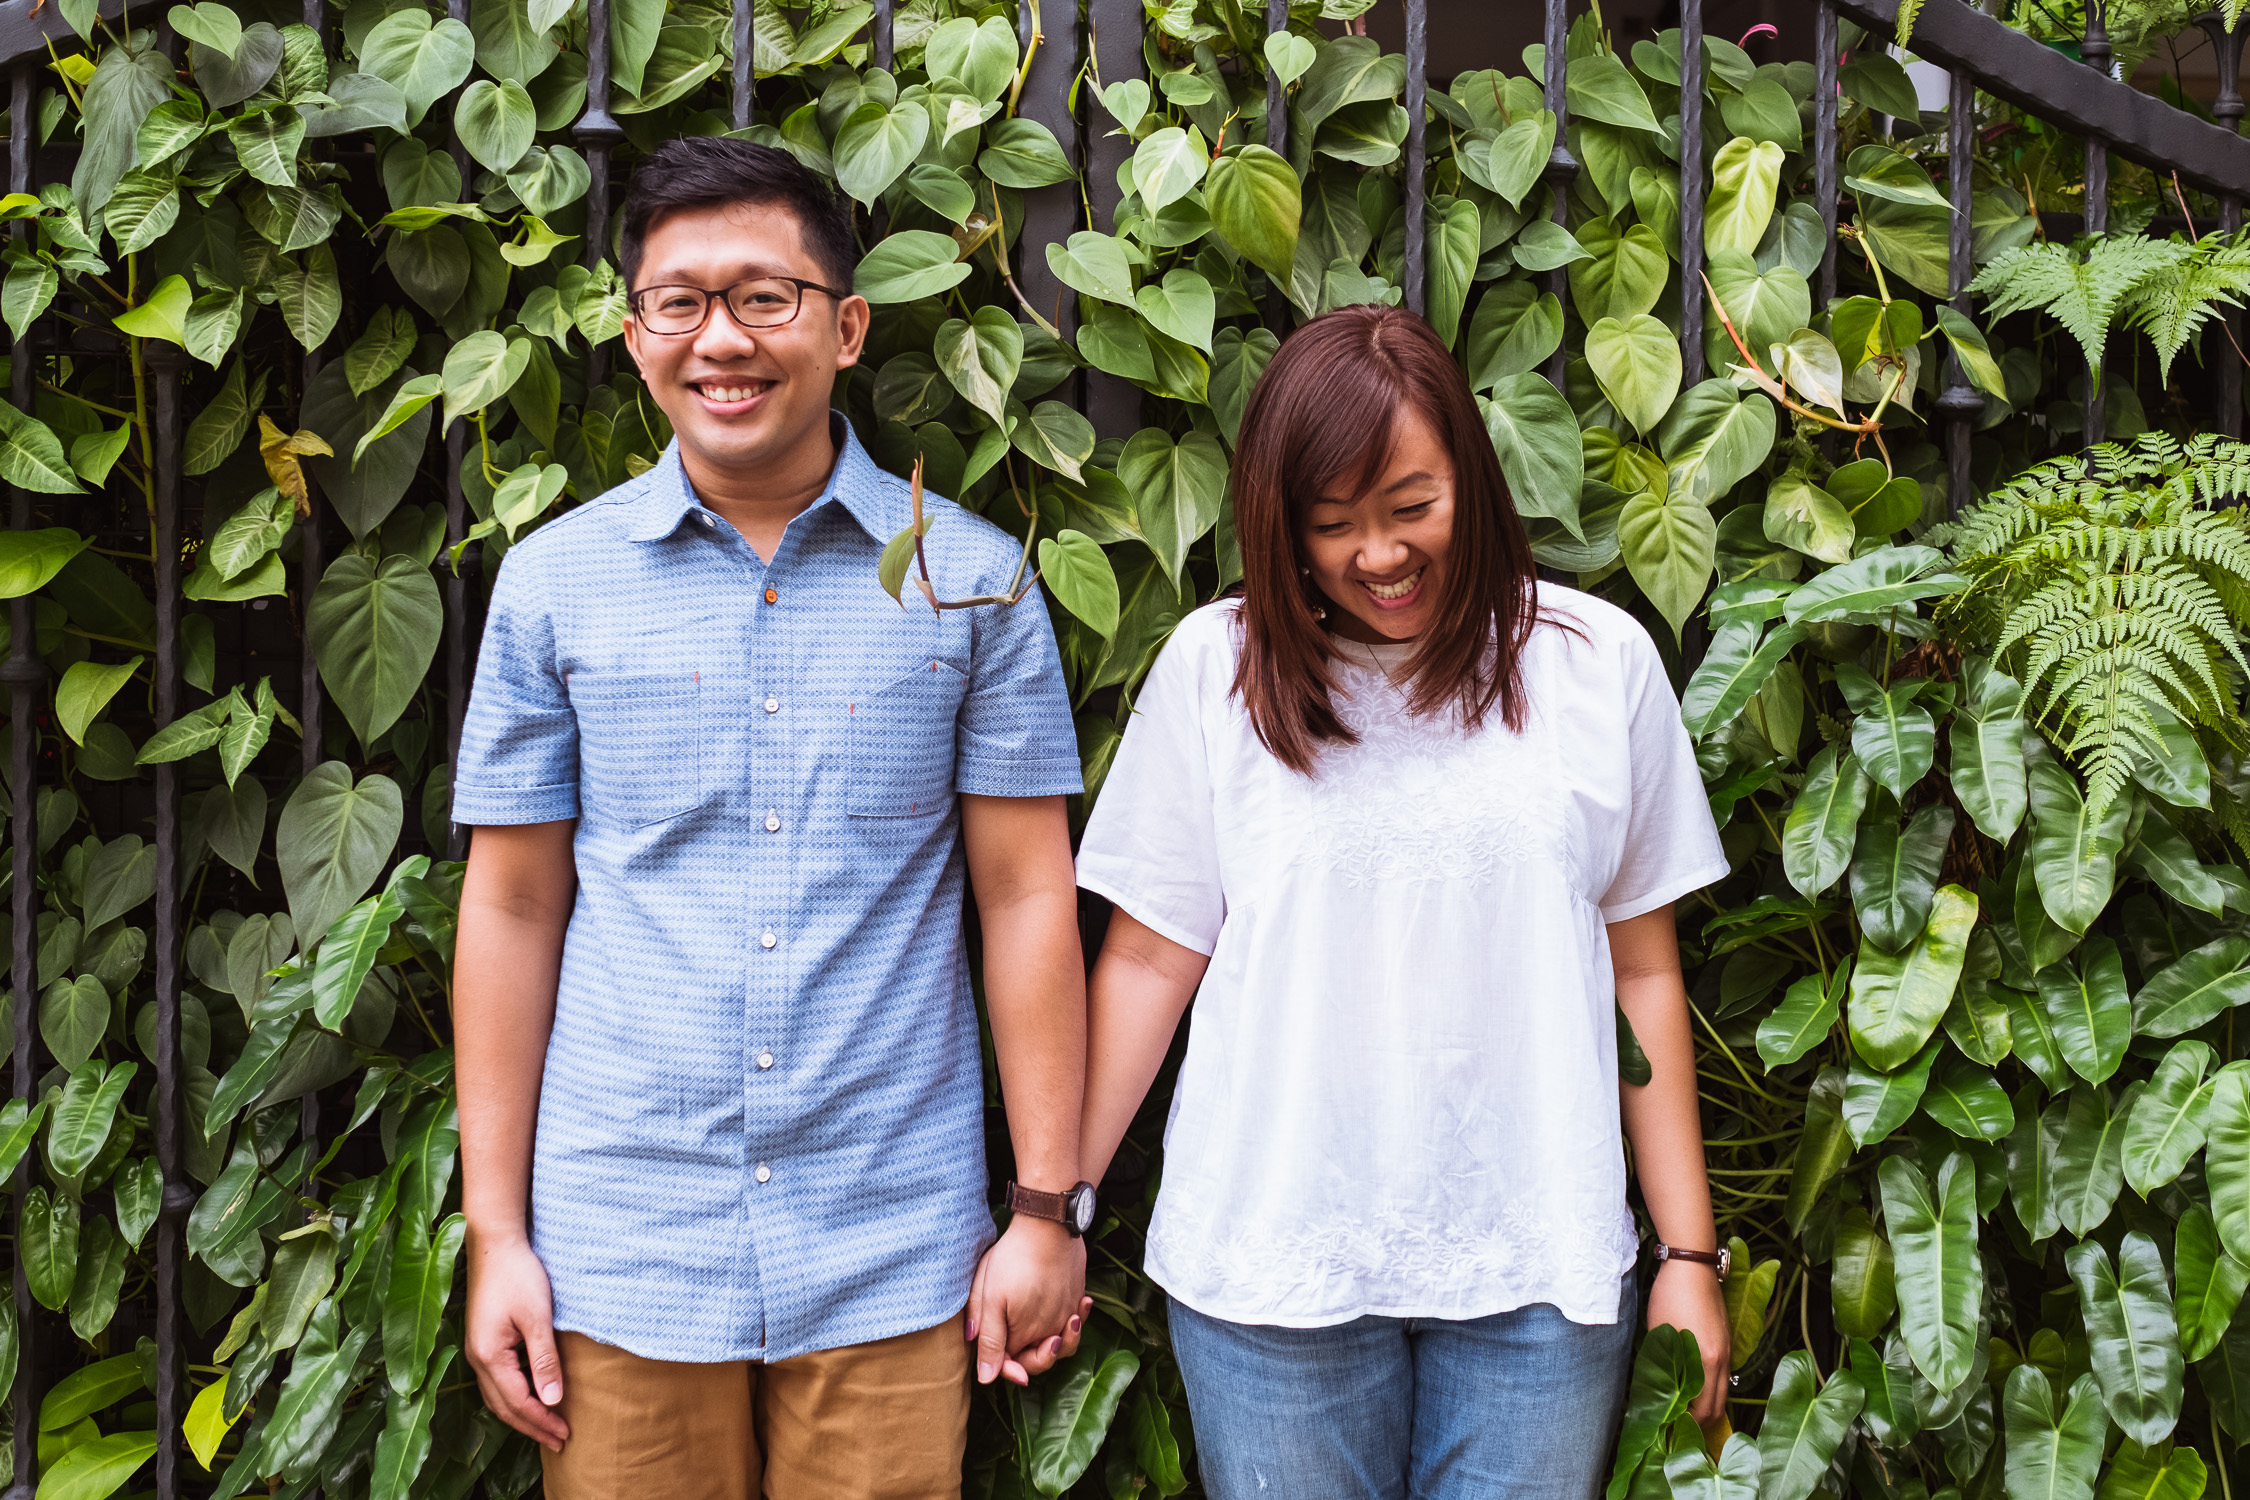 Smiling couple in Singapore prewedding shoot